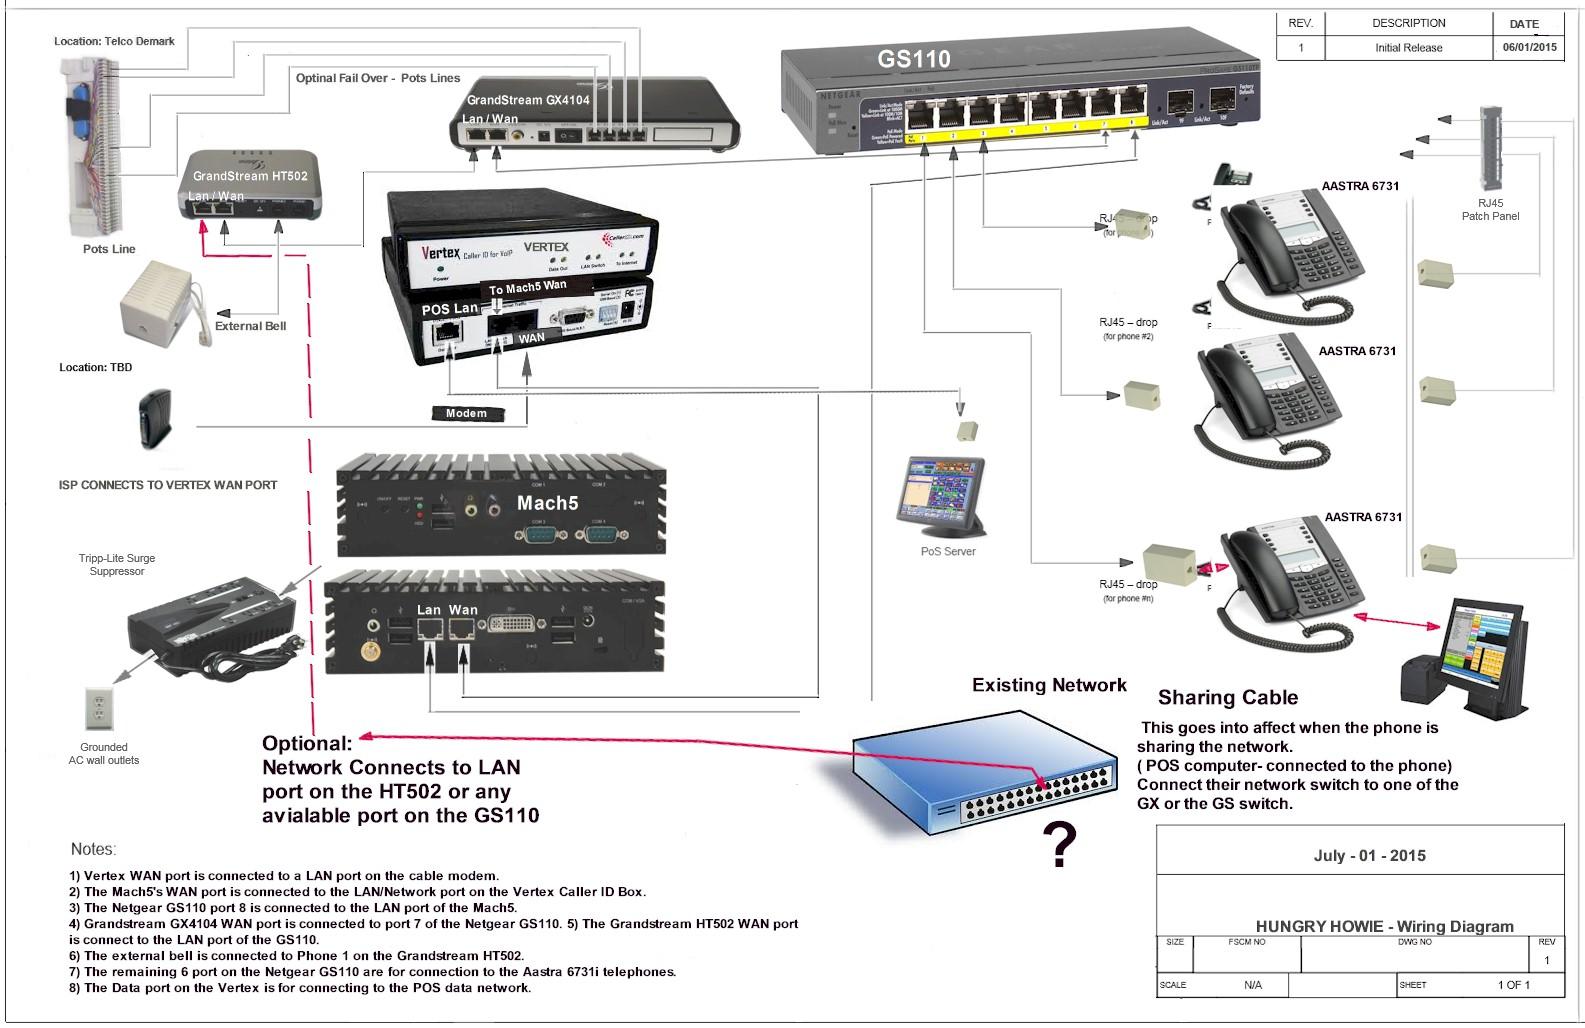 medium resolution of wan wiring diagram wiring diagrams lolhungry howie wiring diagram modem diagram 1 vertex wan port